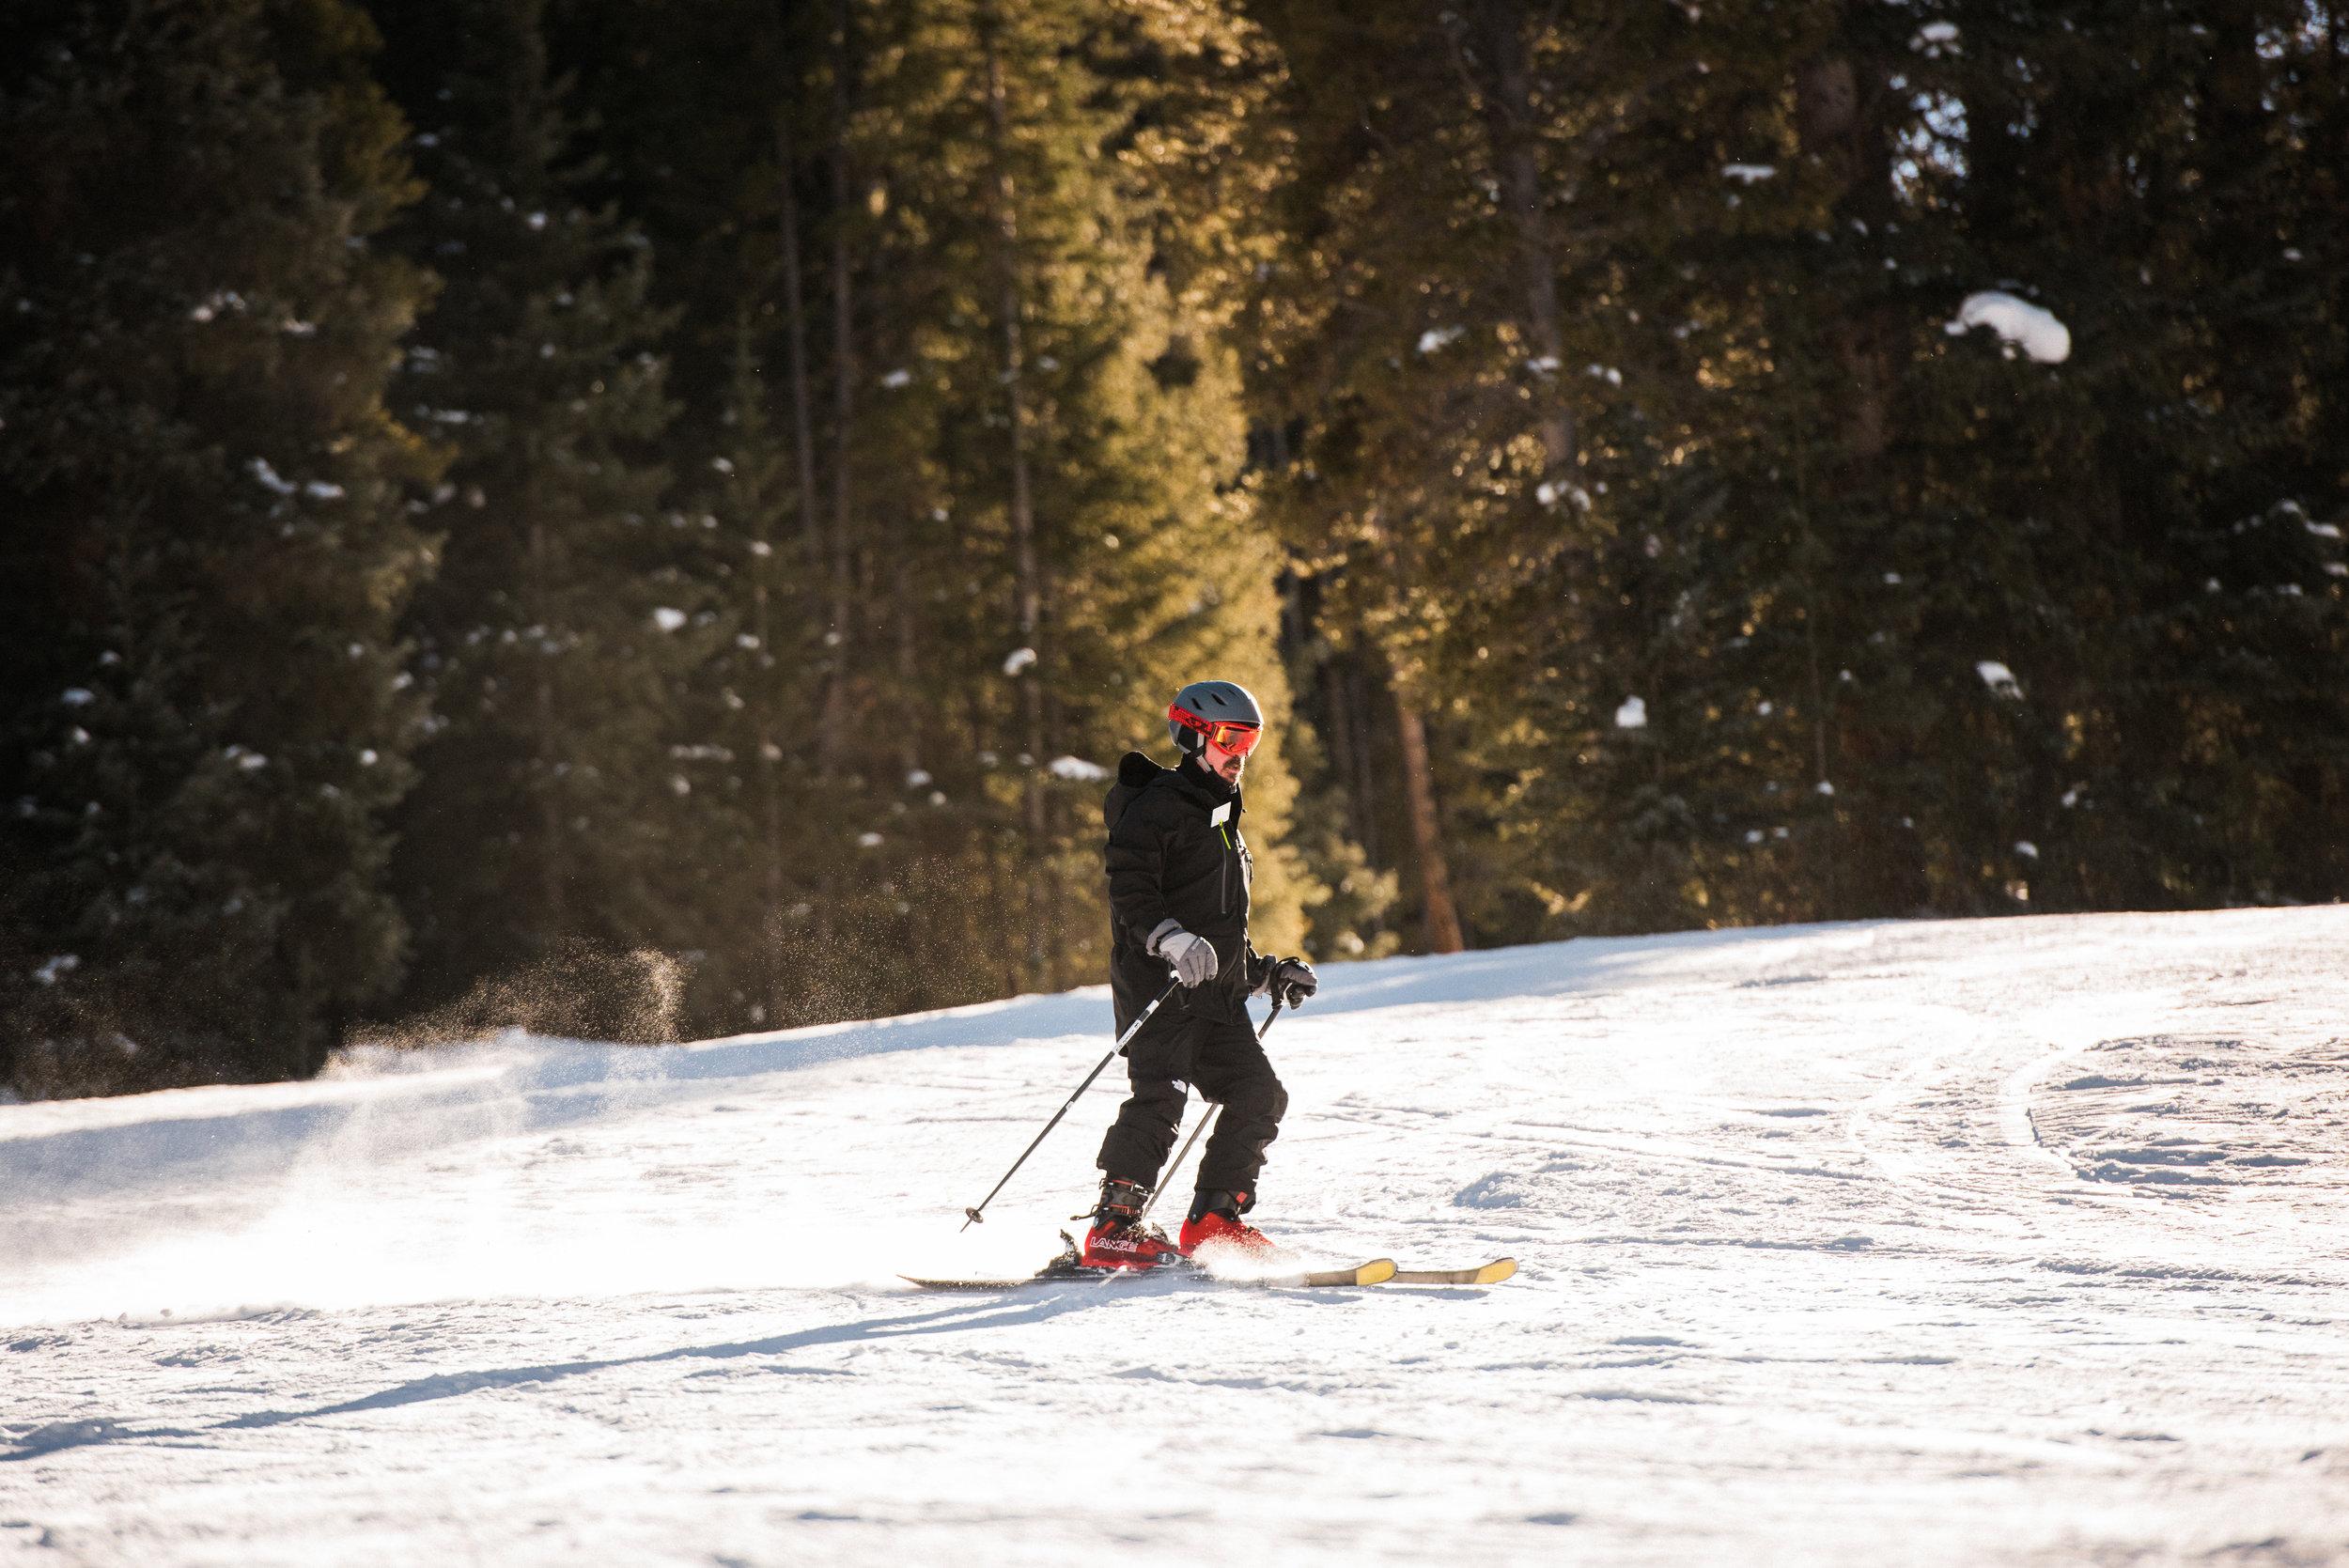 TaraShupe_Outdoor_Photographer_Loweprobags_Colorado_Copper_Mountains_Ski_50.jpg